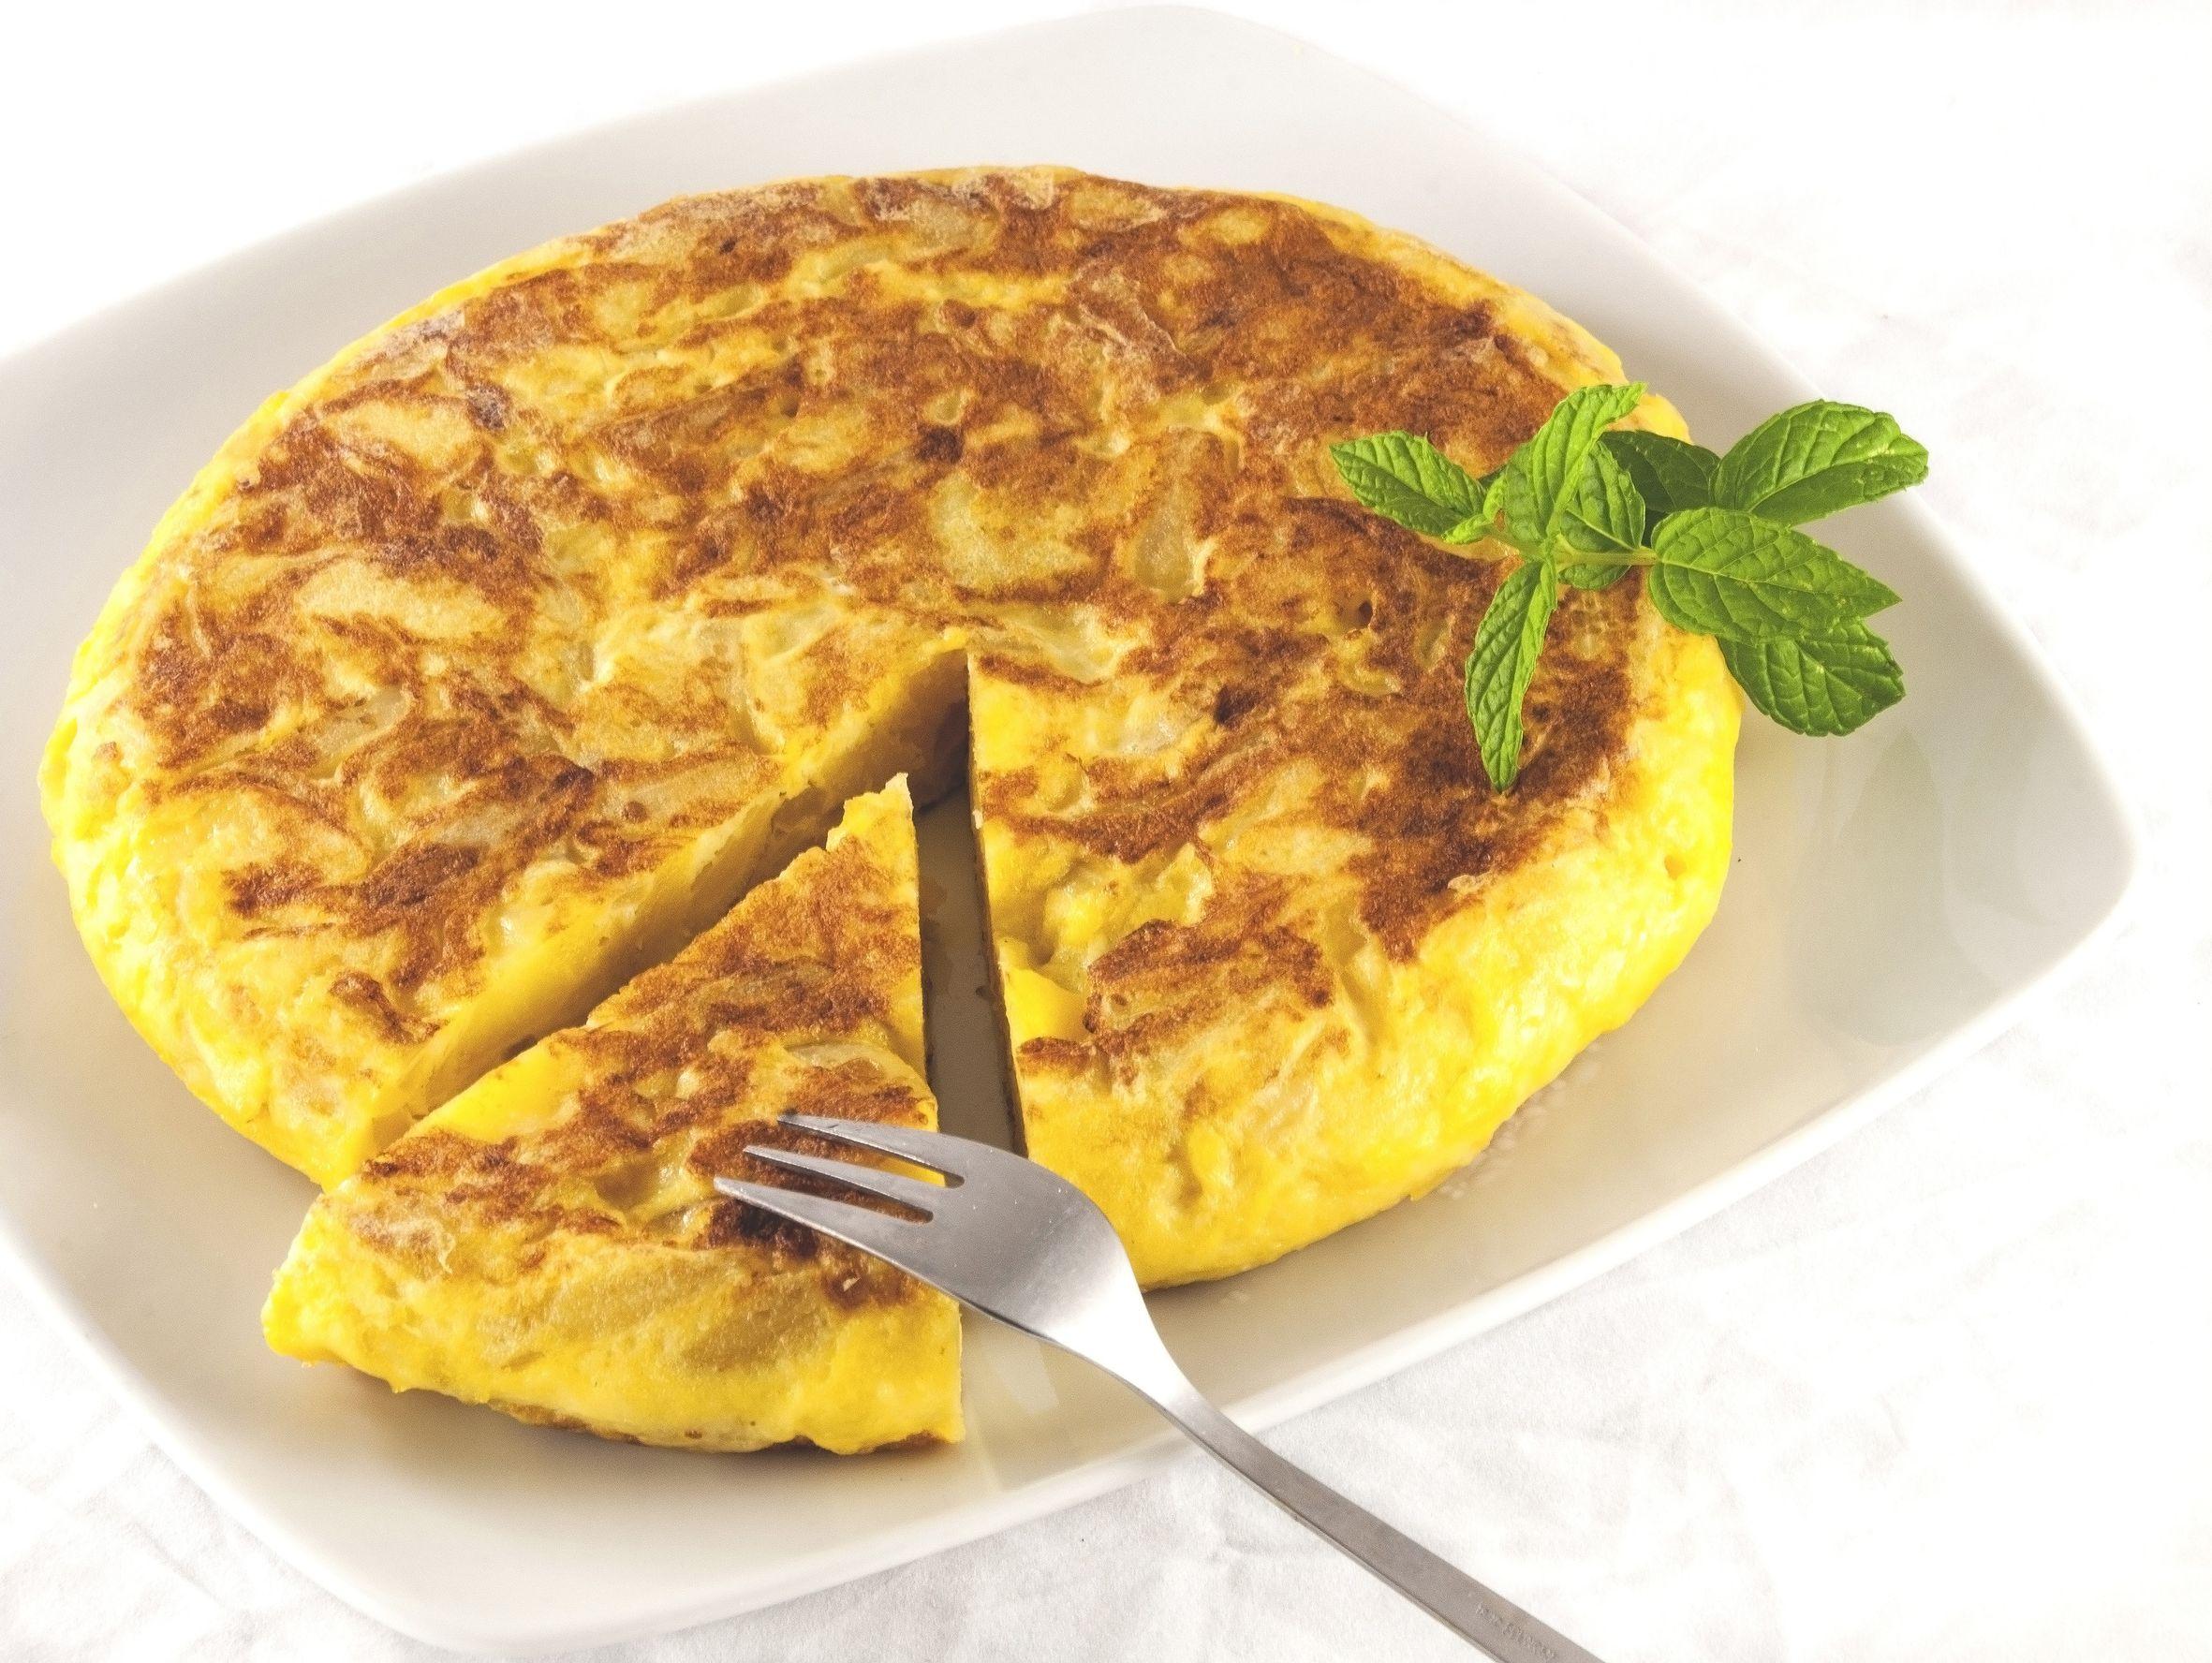 red dwarf spanish omelet - photo #34